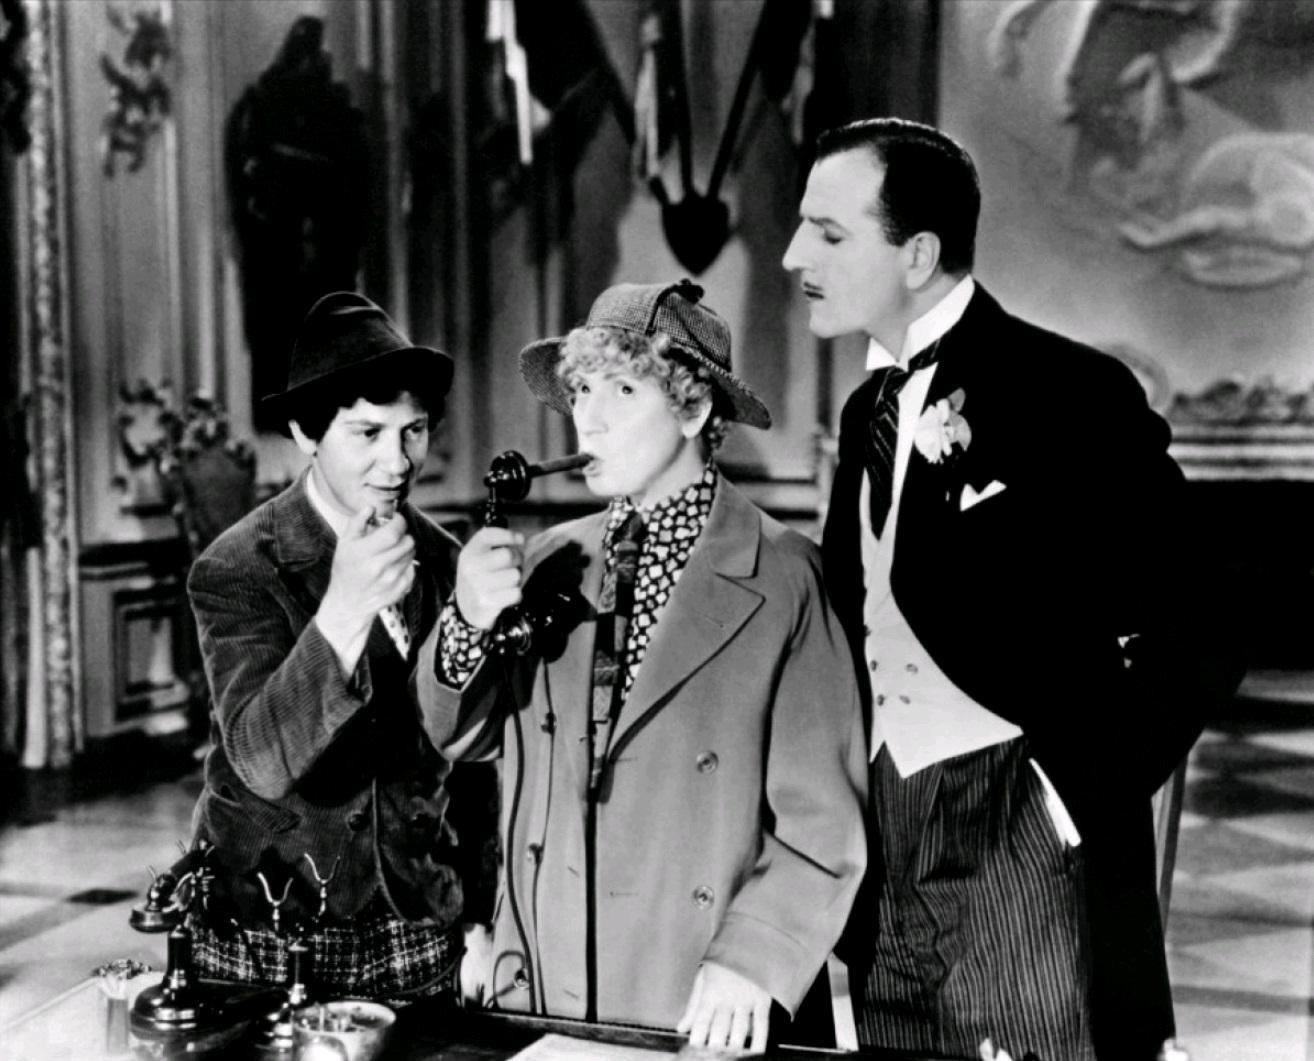 Luchshie-filmyi-v-retsenziyah-Utinyiy-sup-Duck-Soup-1933-3